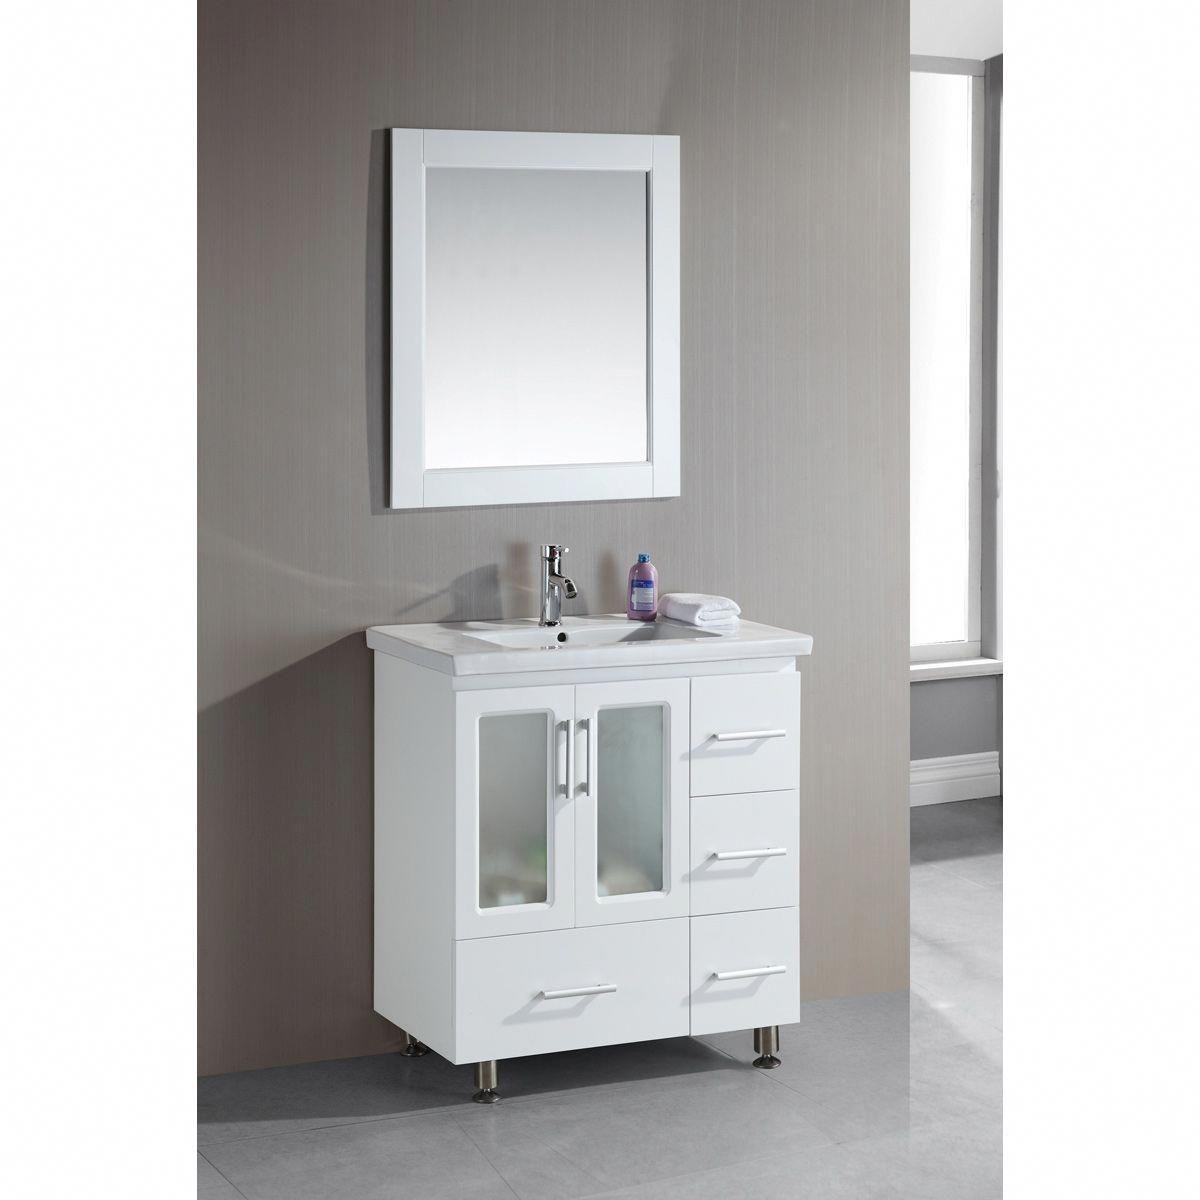 Design Element 32 Inch Single Drop In Sink Vanity 32 Single Drop In Sink Vanity White Color Small Bathroom Vanities Modern Bathroom Cabinets Trendy Bathroom